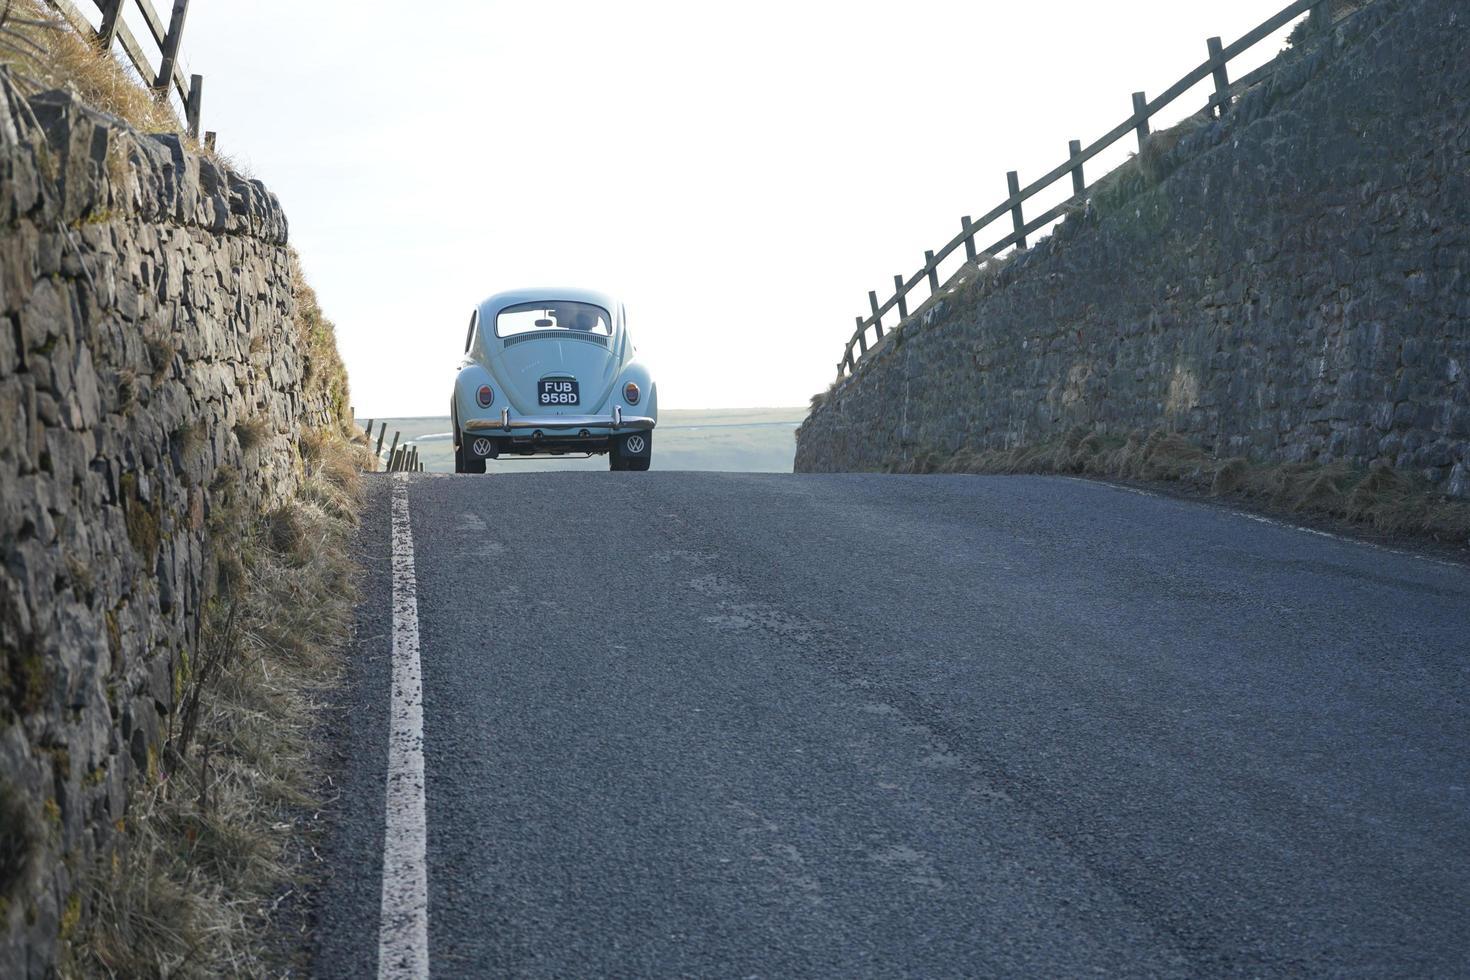 Volkswagen Beetle coche en la carretera foto